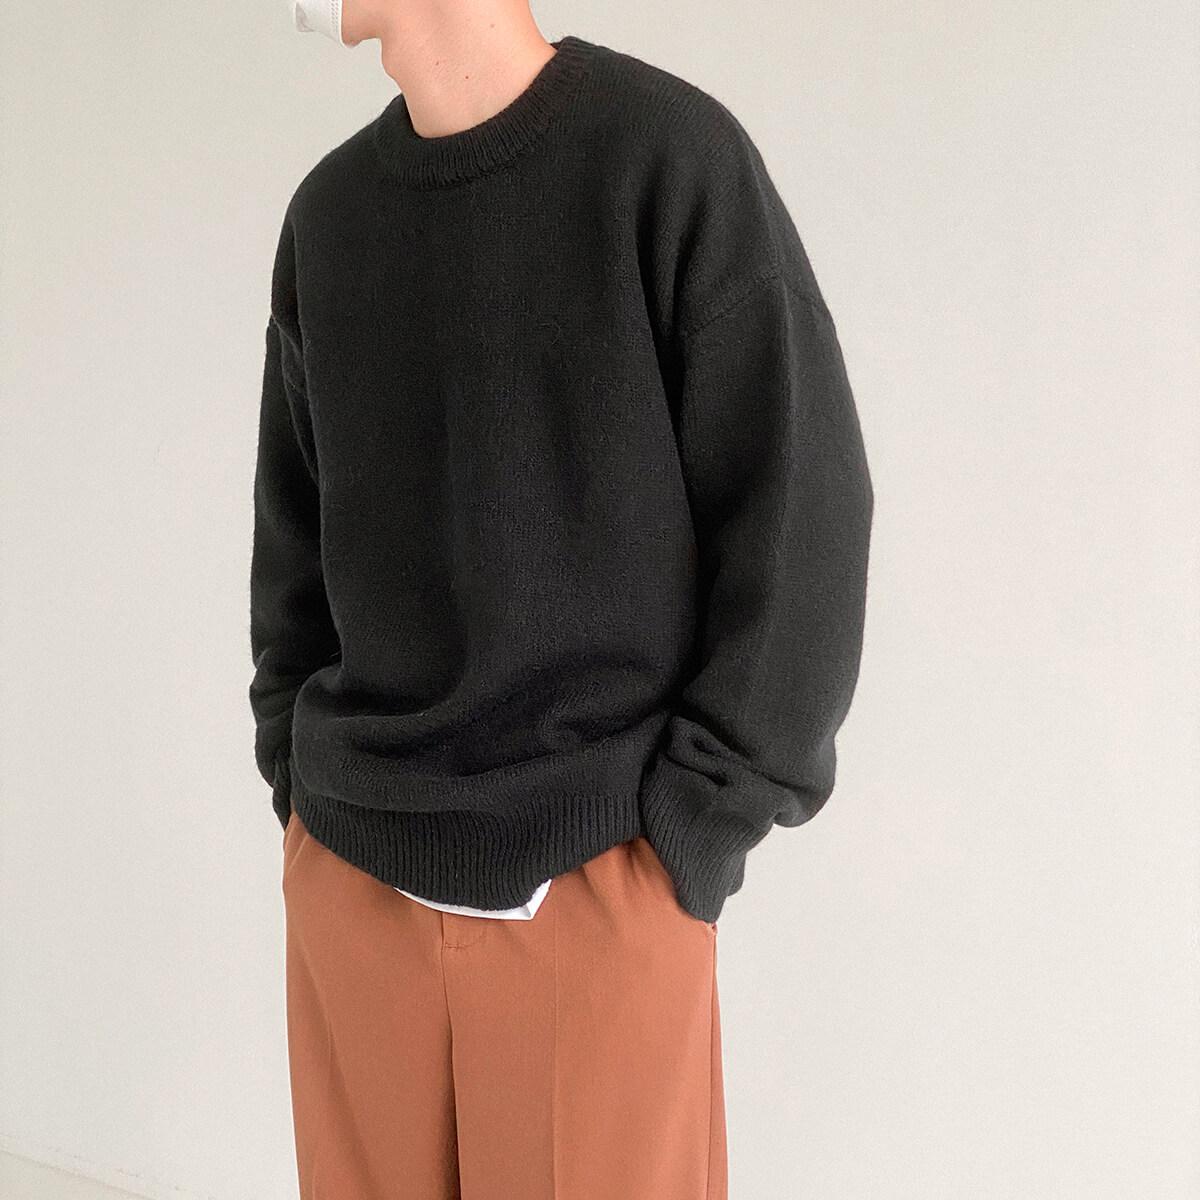 Свитер DAZO Studio Solid Colored Woolen Sweater Yarn (8)